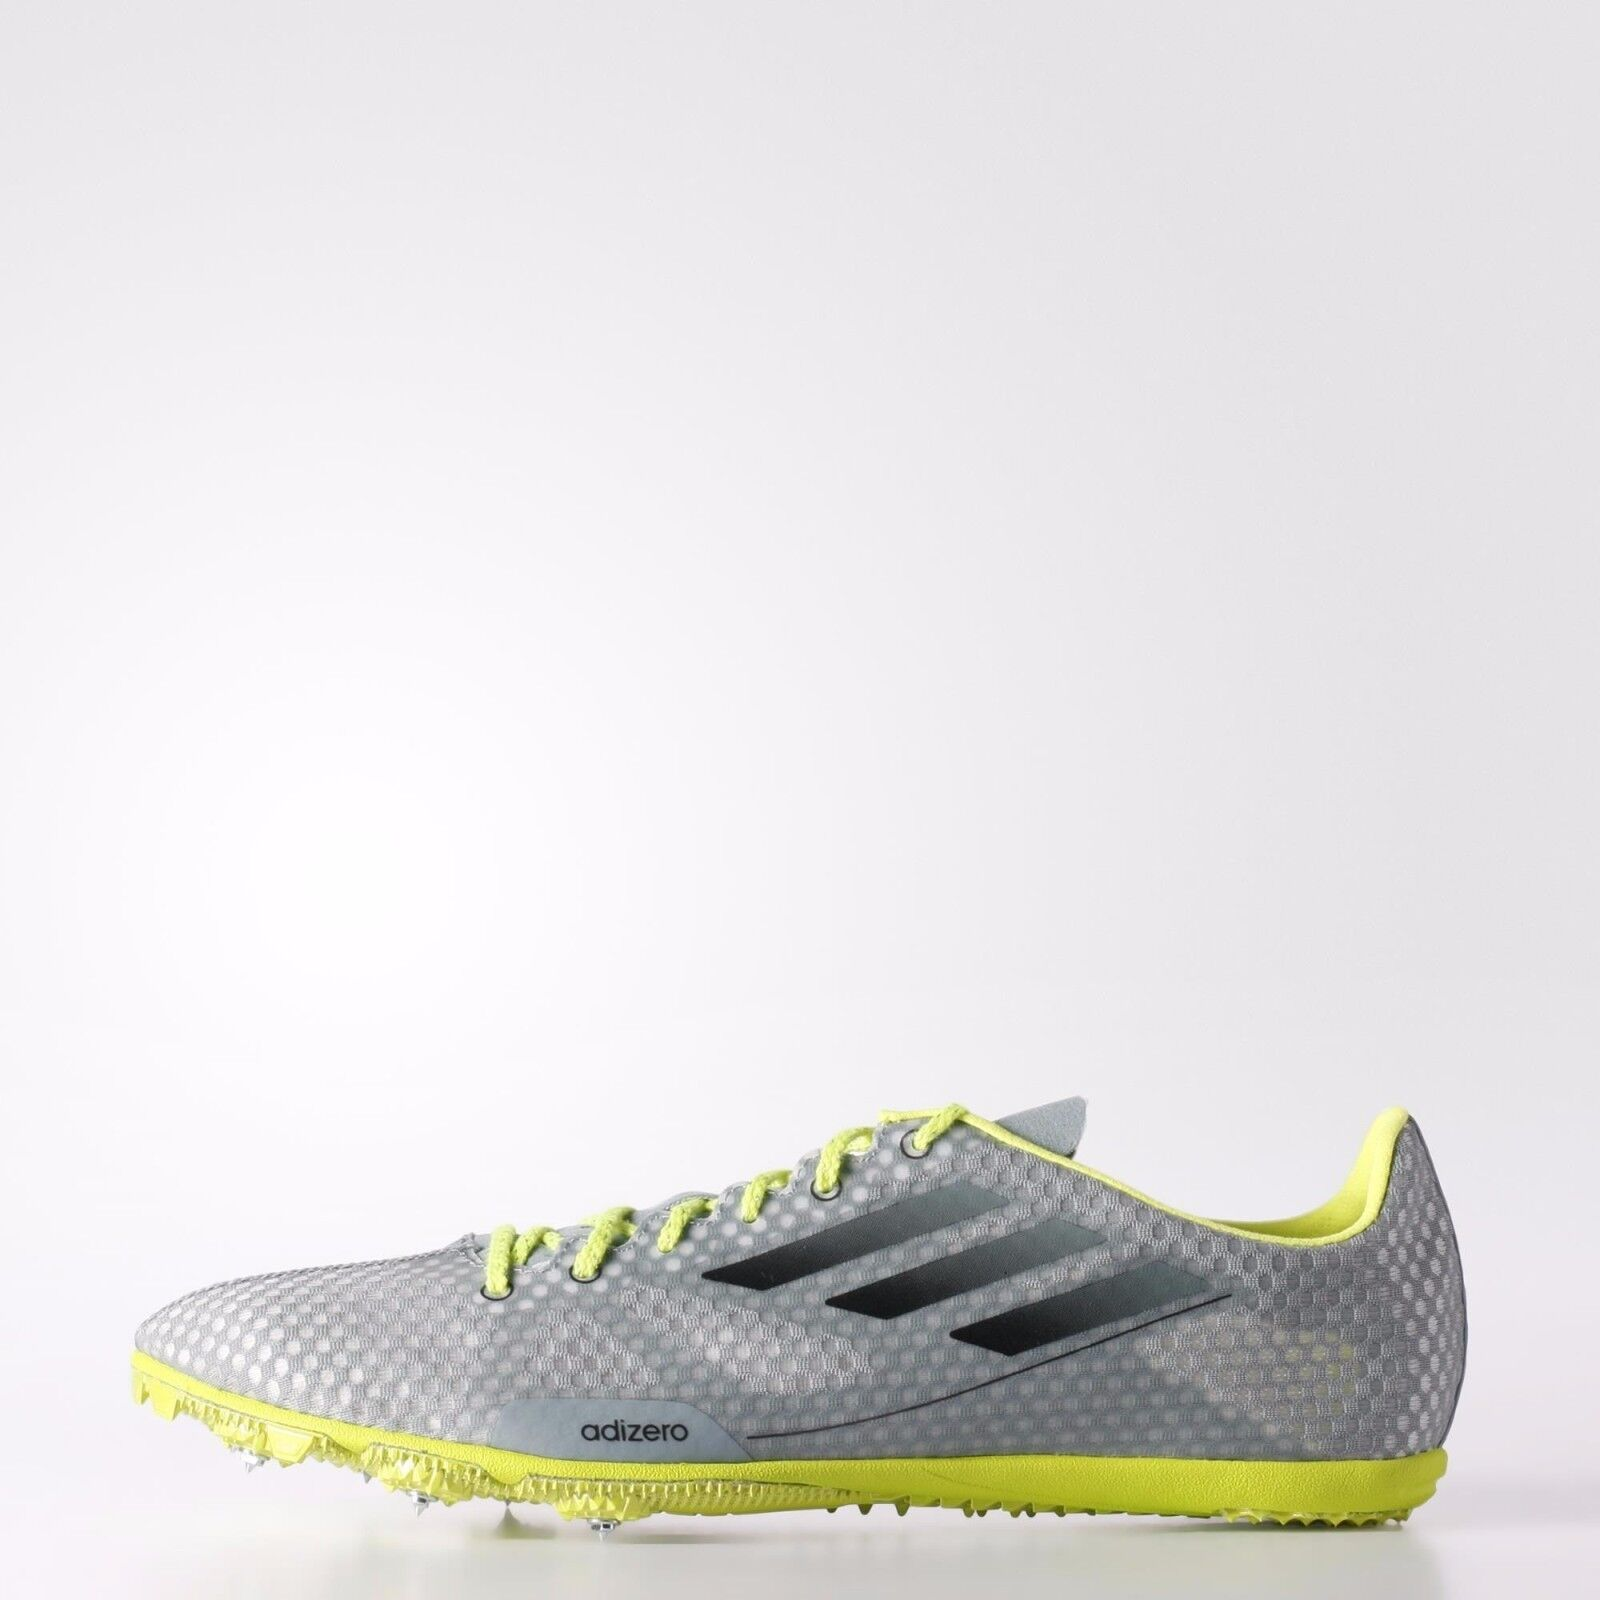 a9708a148 Adidas Adizero Ambition 2 shoes (B23448) size 11